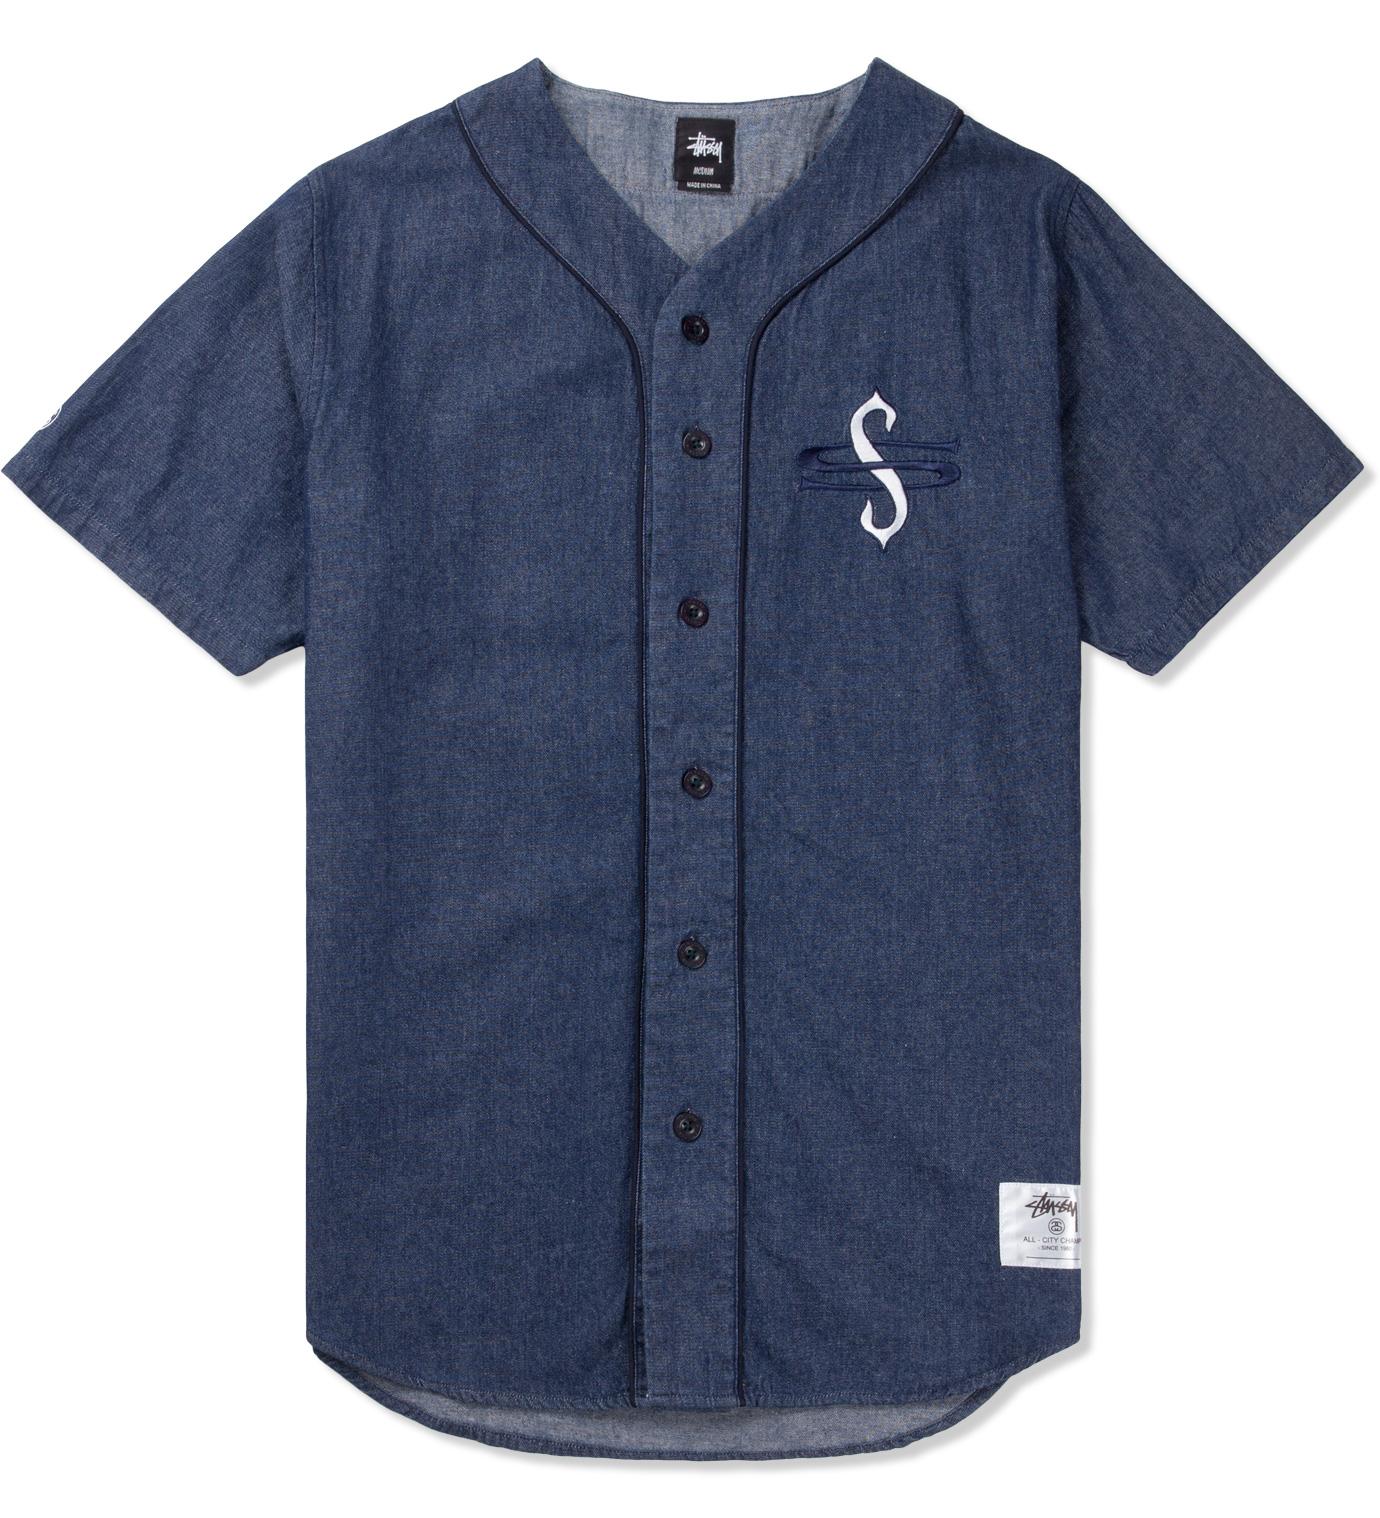 Stussy Light Blue Denim Baseball Shirt Hbx